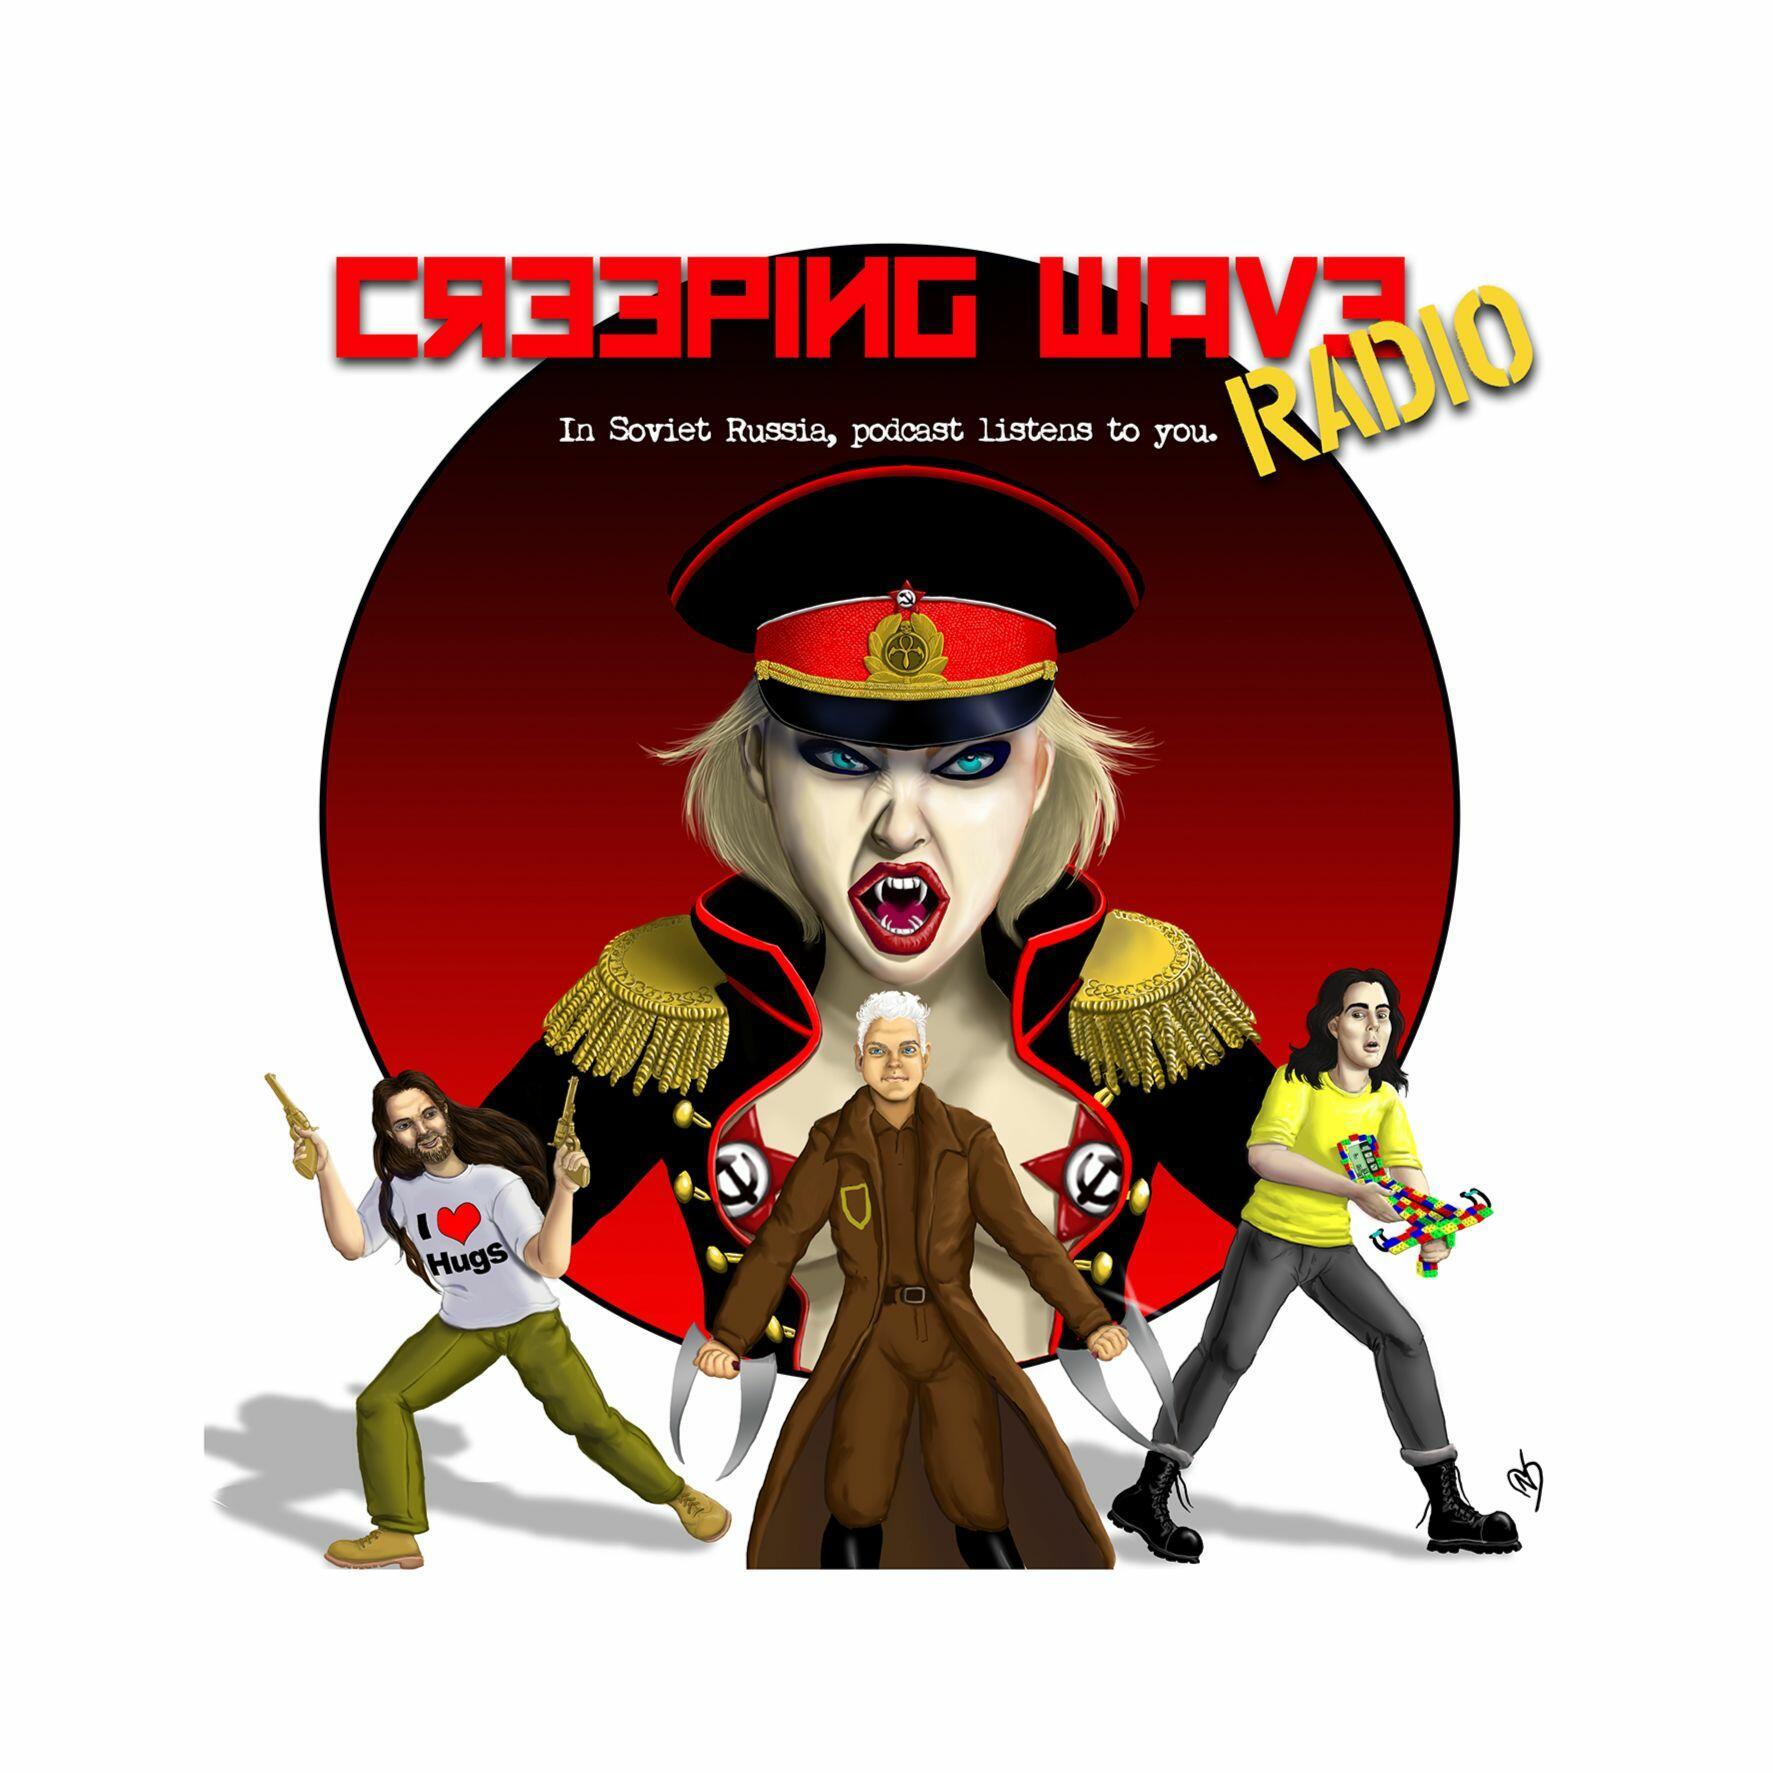 Creeping Wave Radio